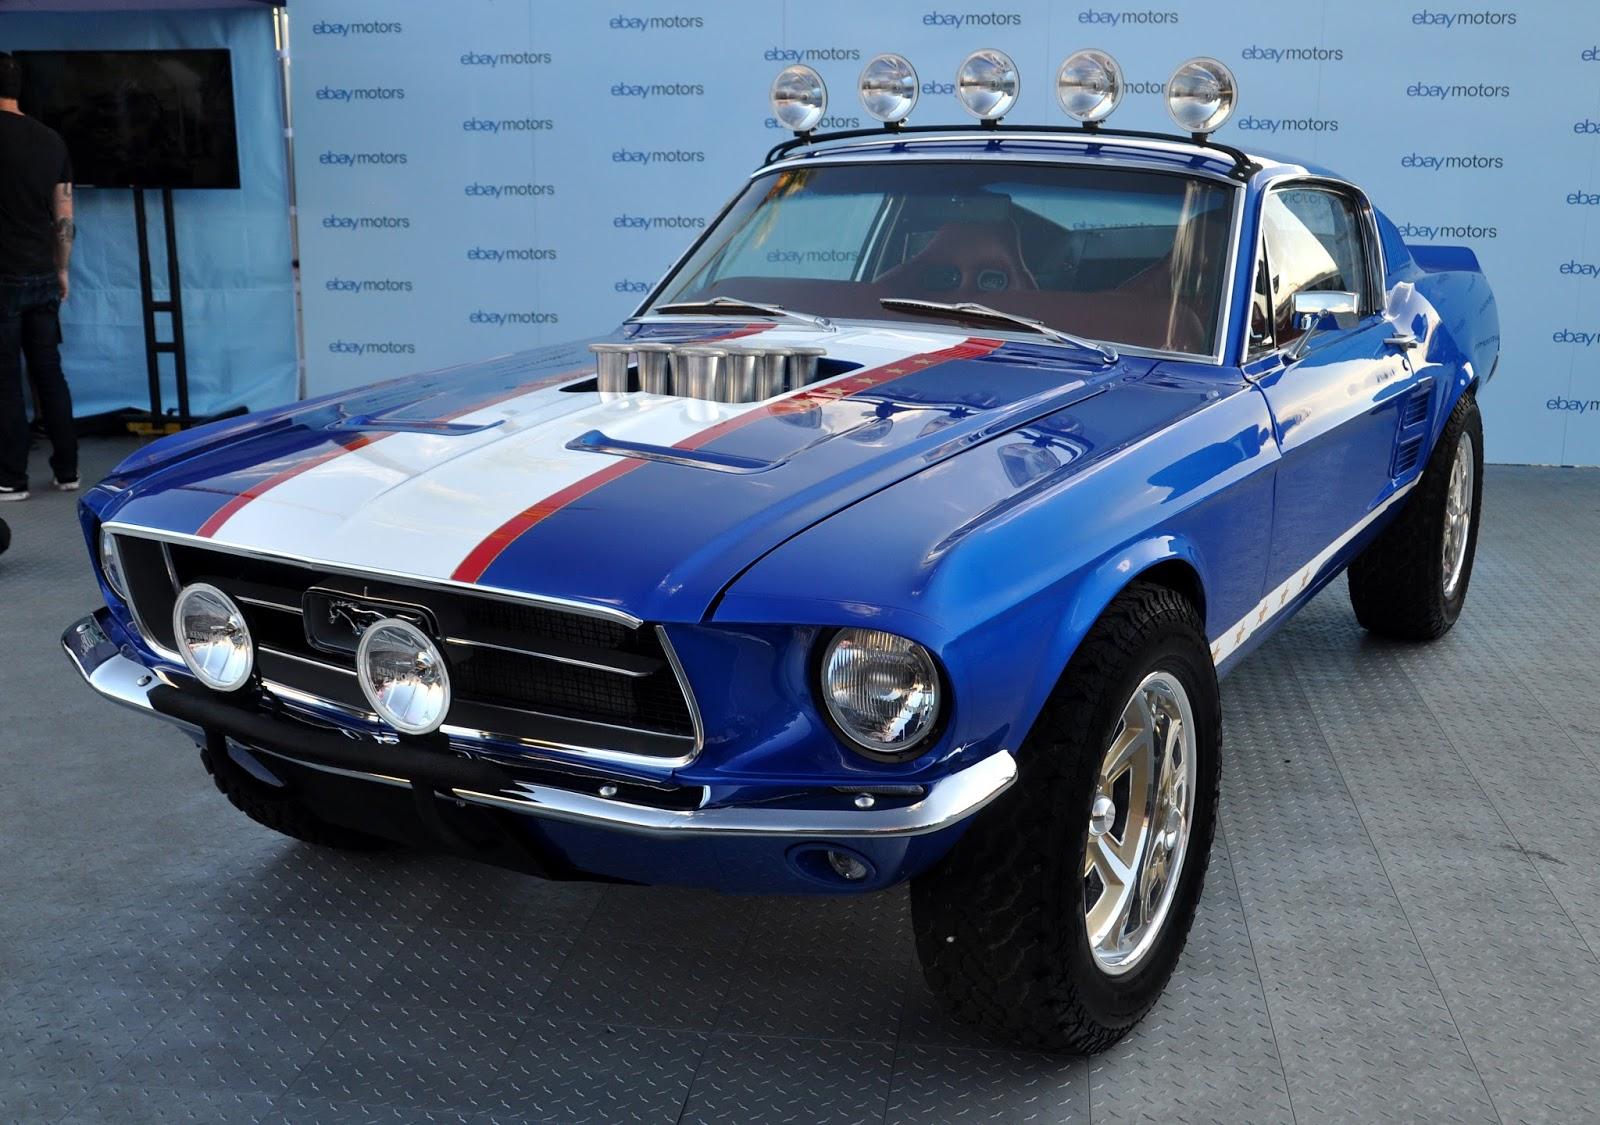 Just A Car Guy Ebay Motor S Rowdy 67 Mustang Fastback